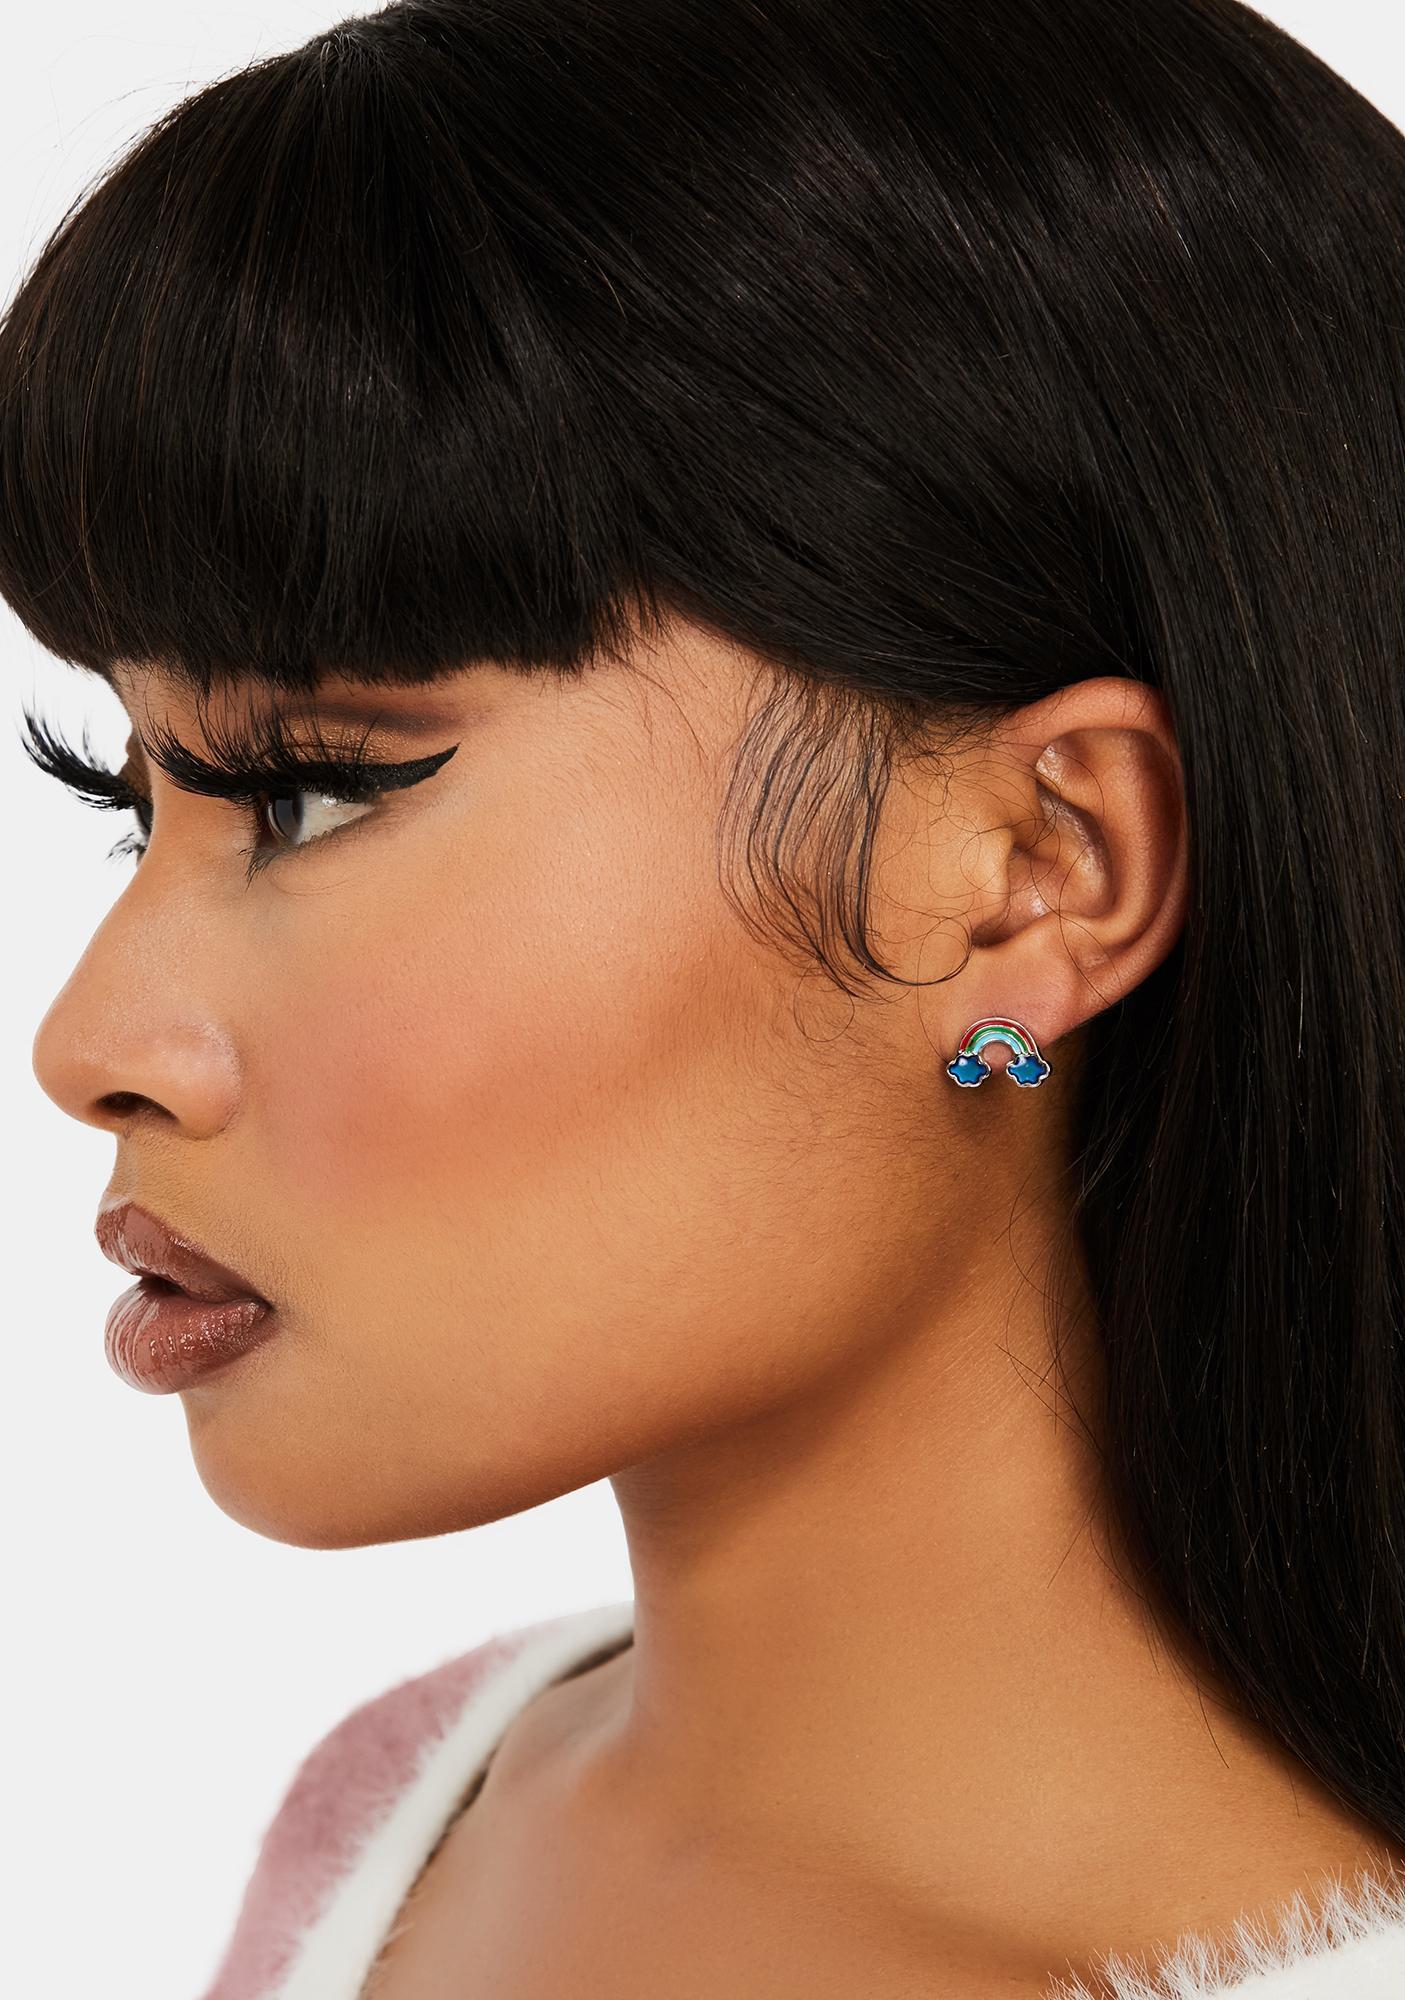 Seasons Change Mood Earrings